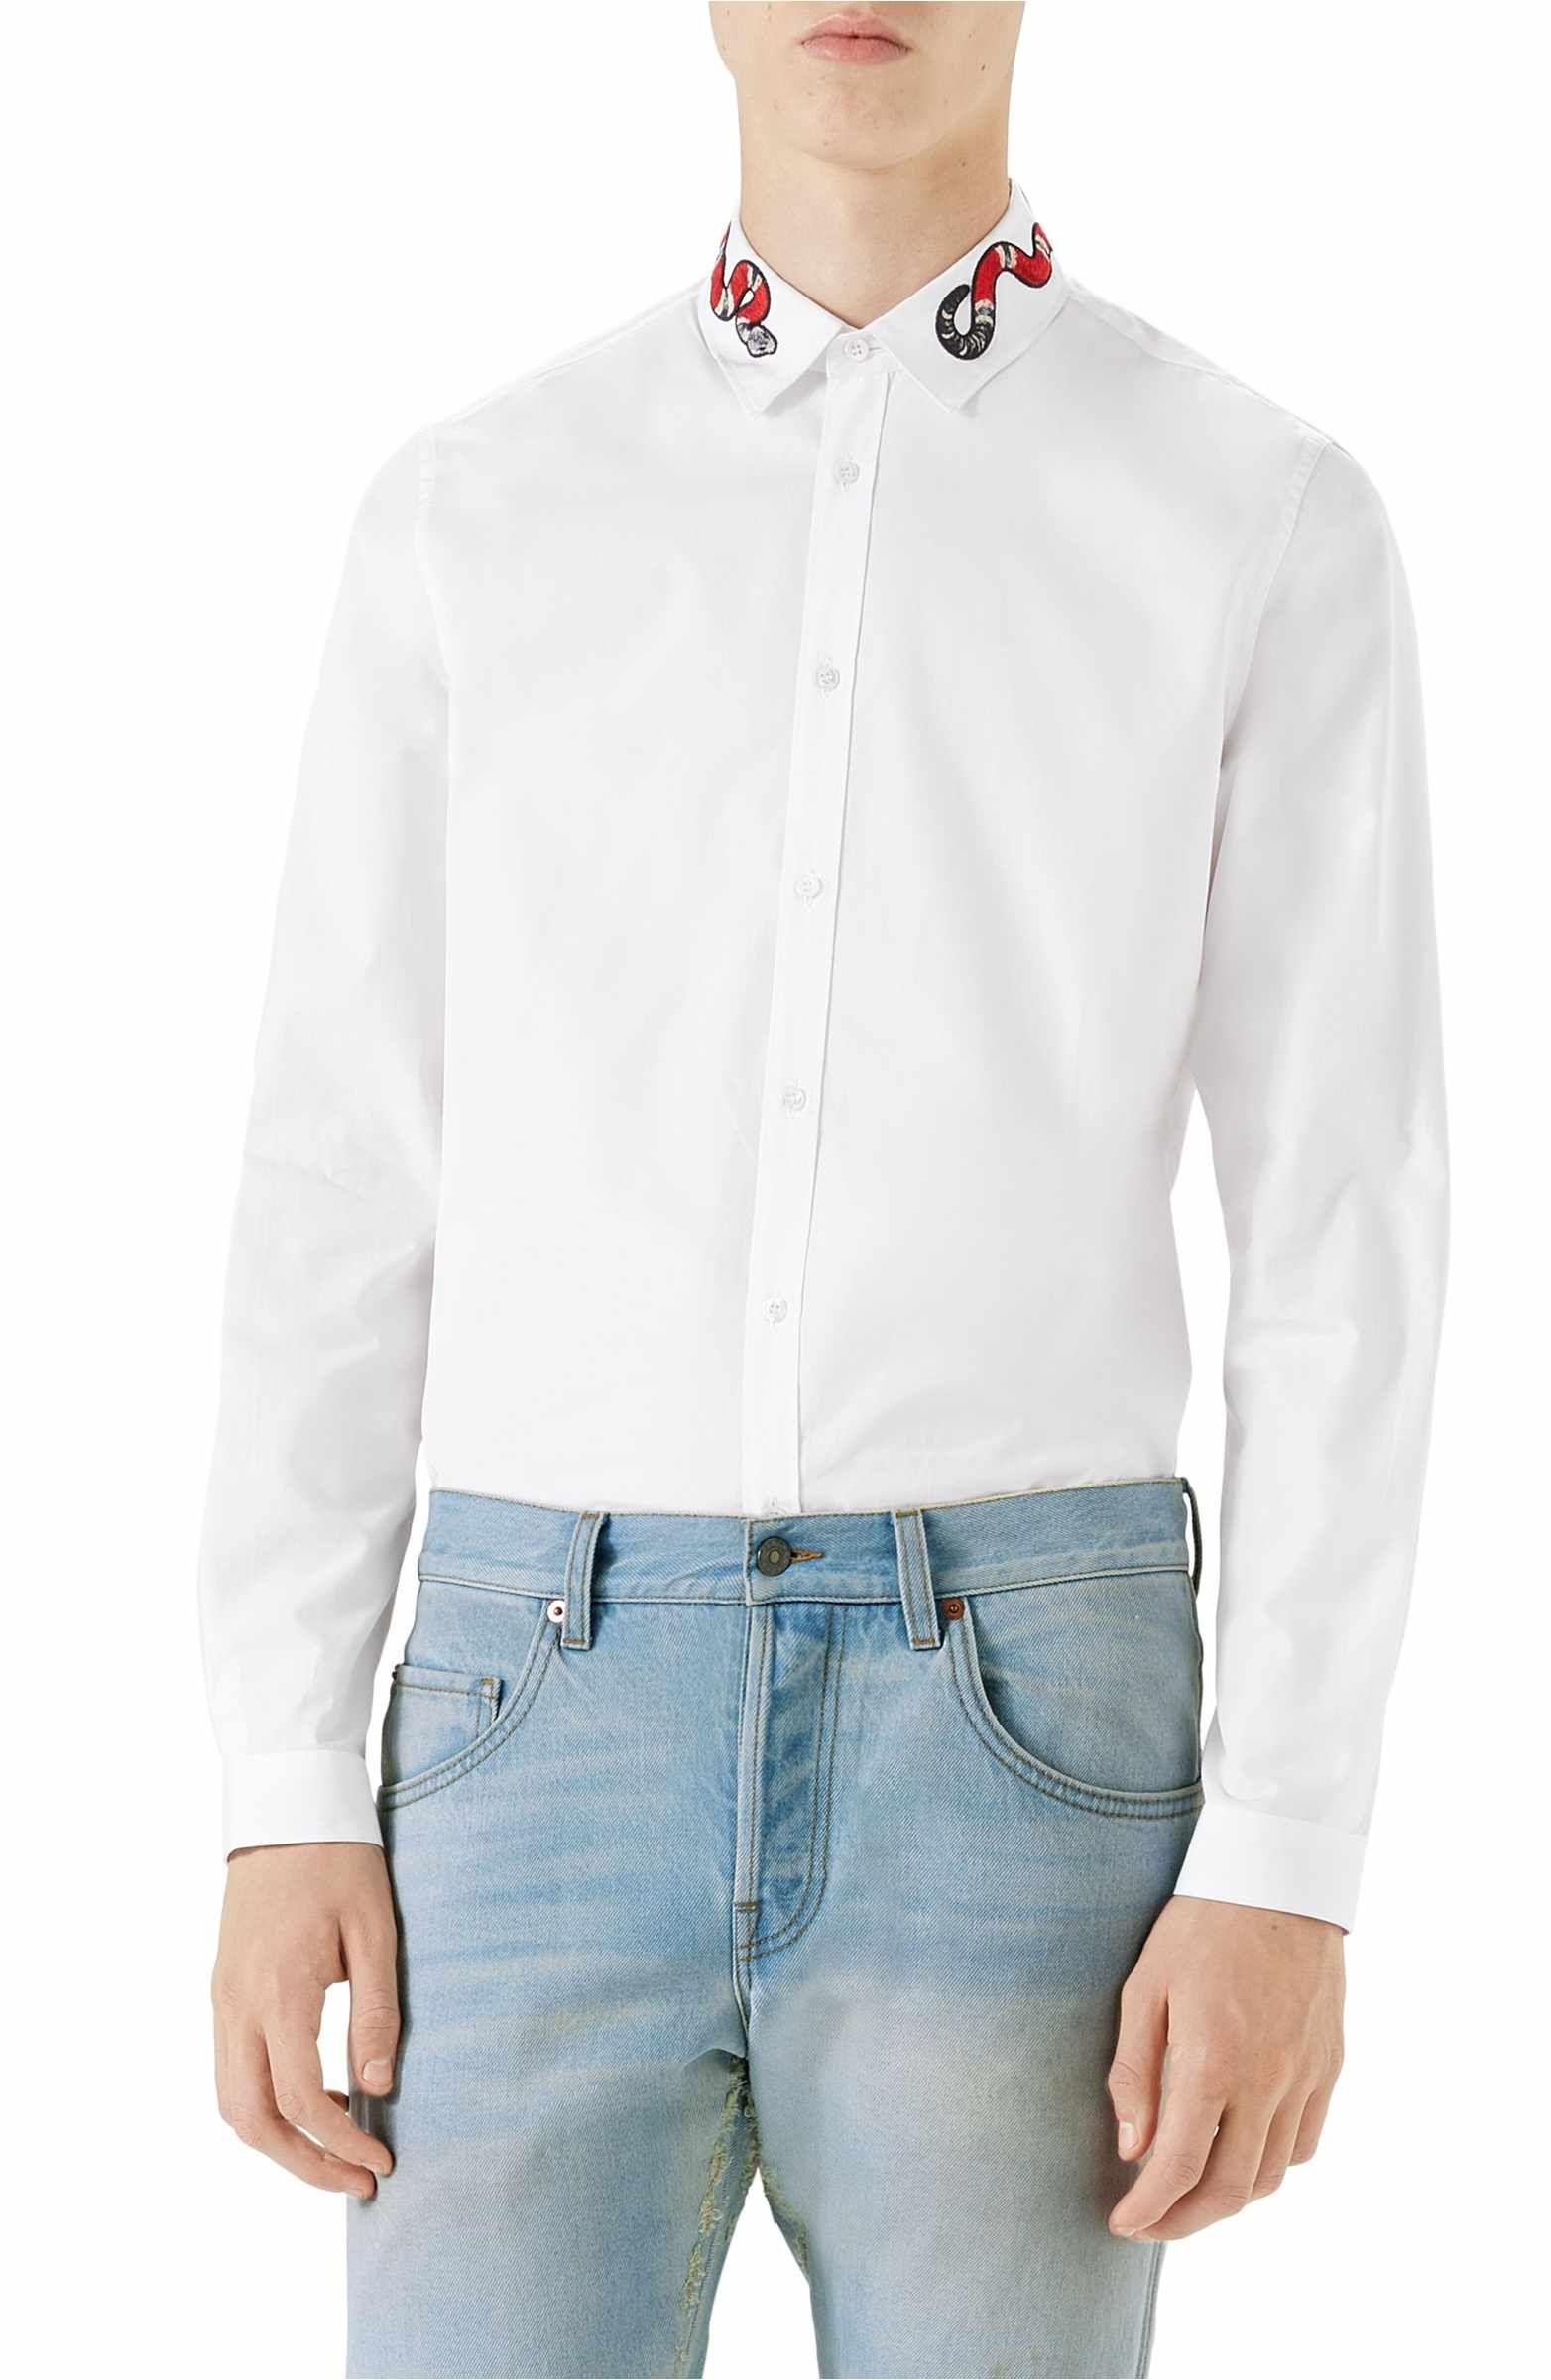 Main Image Gucci Snake Embroidered Collar Shirt Faves Collar